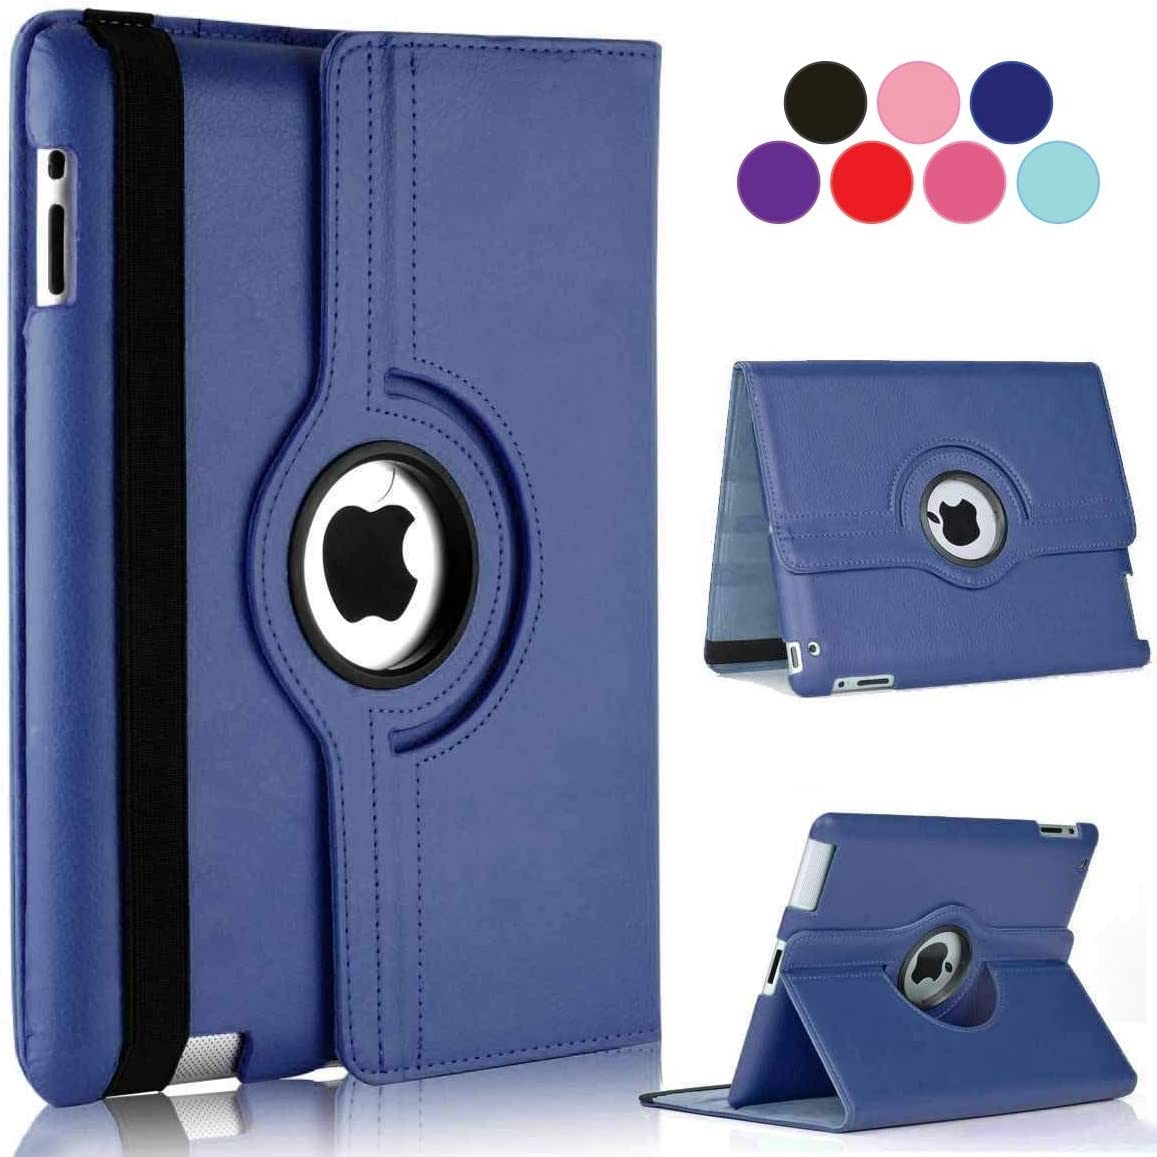 Vultic iPad Pro 9.7 Case (2016) - 360 Degree Rotating Stand [Auto Sleep/Wake] Folio Leather Smart Cover Case for Apple iPad Pro 9.7